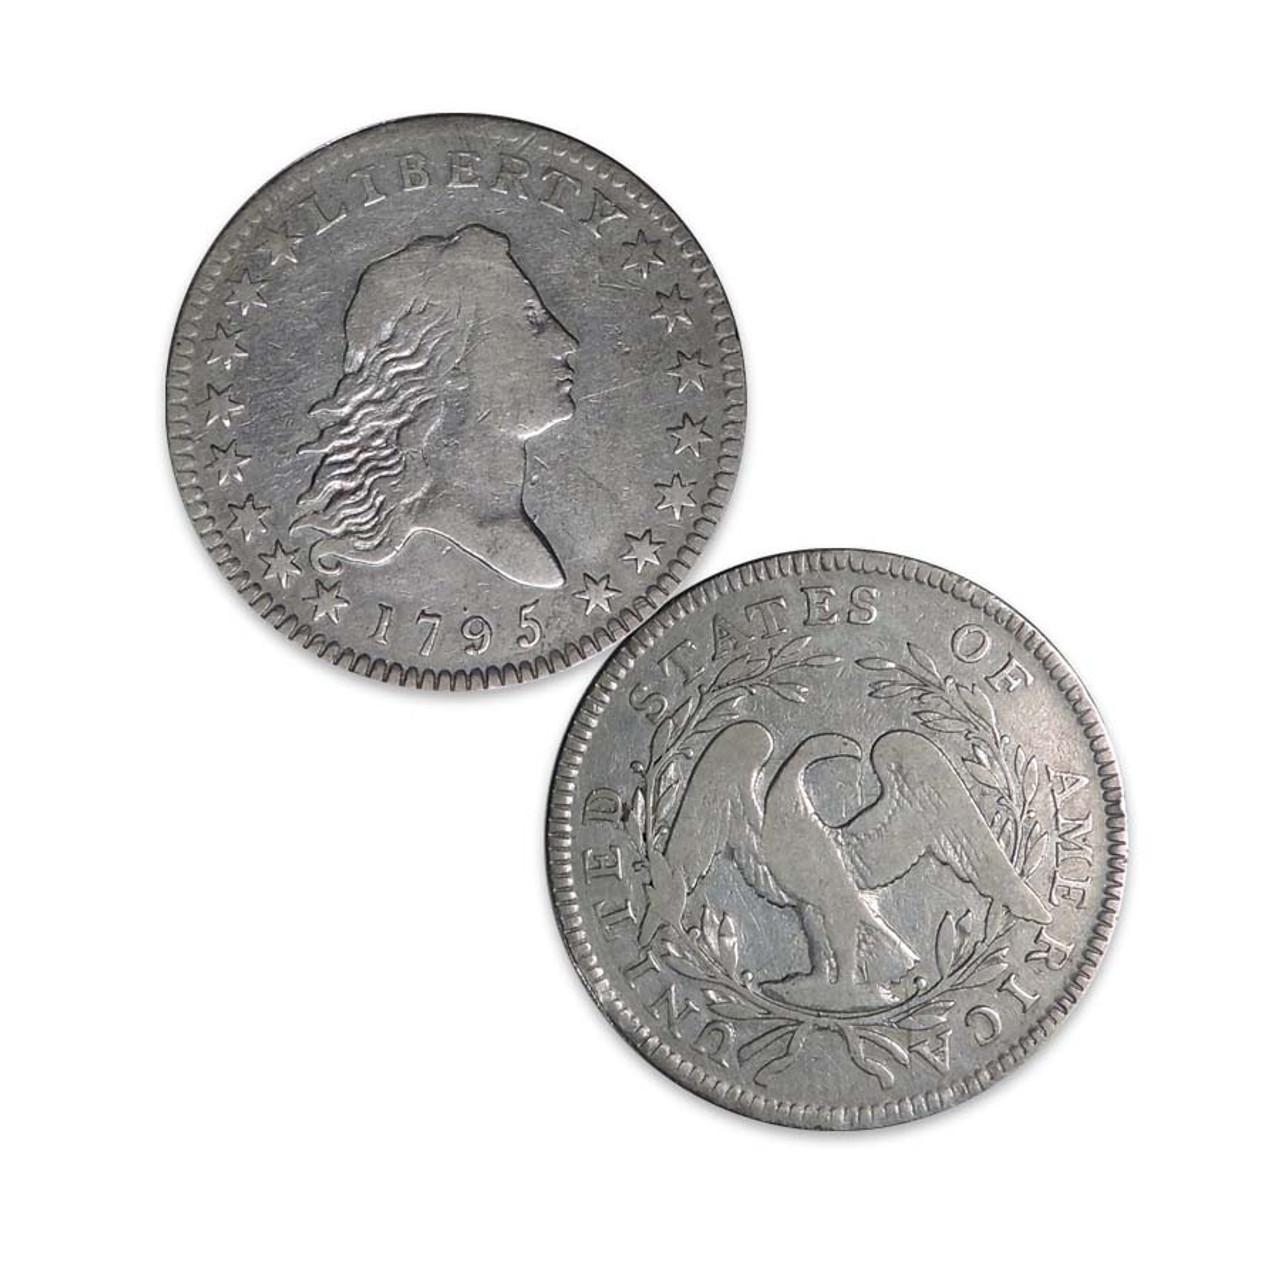 1795 Flowing Hair Silver Half Dollar Very Fine Image 1